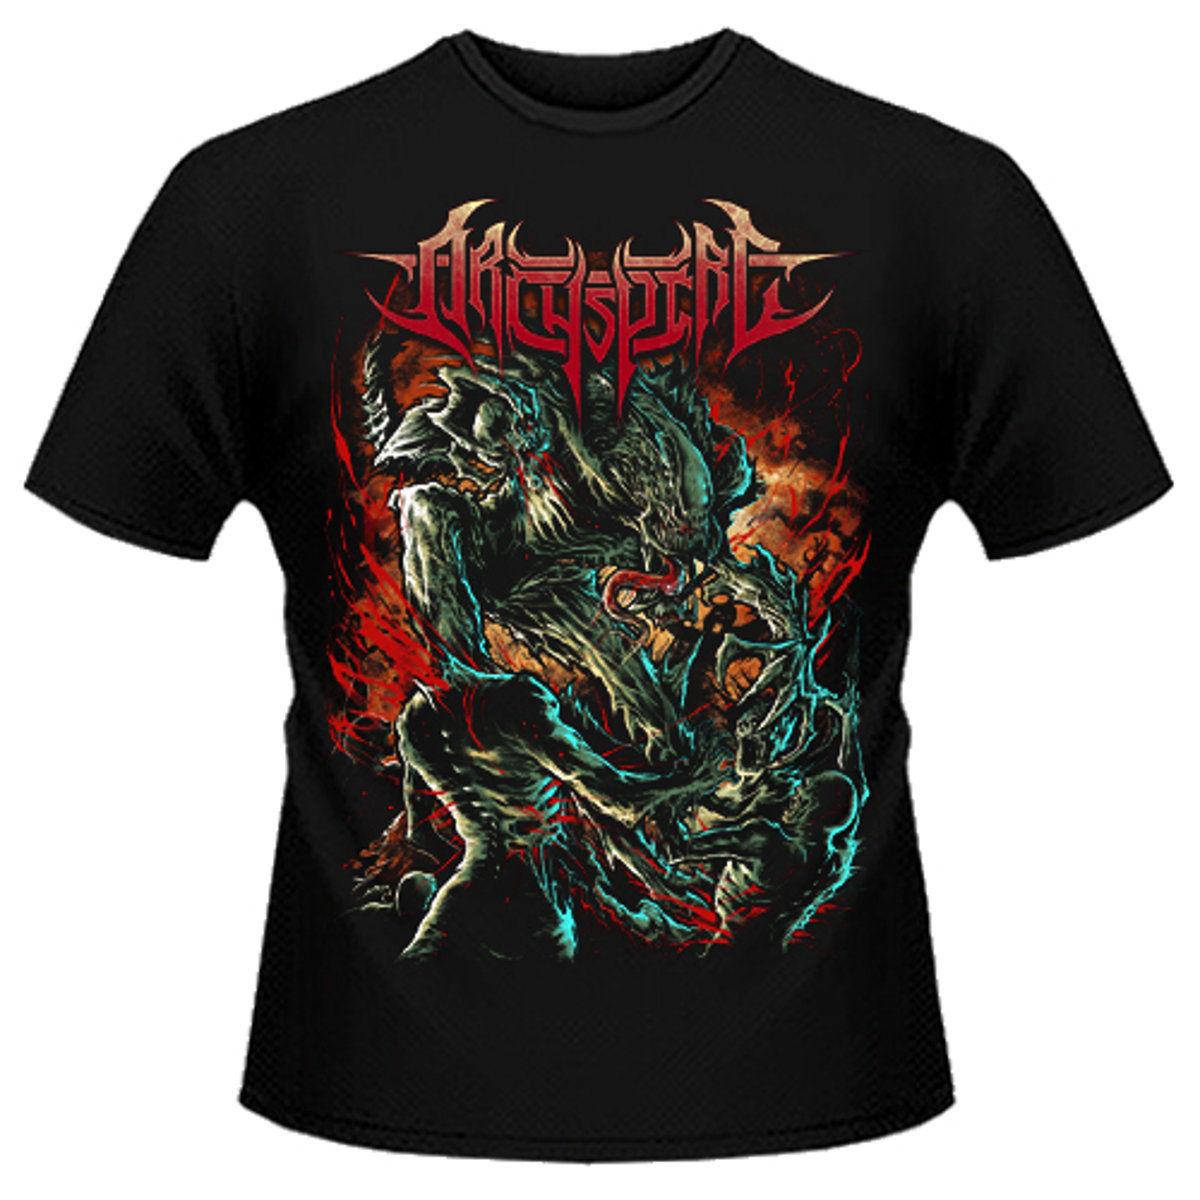 Archspire Stay Tech Shirt S M L XL Death Metal T-Shirt Offcial Band Tshirt